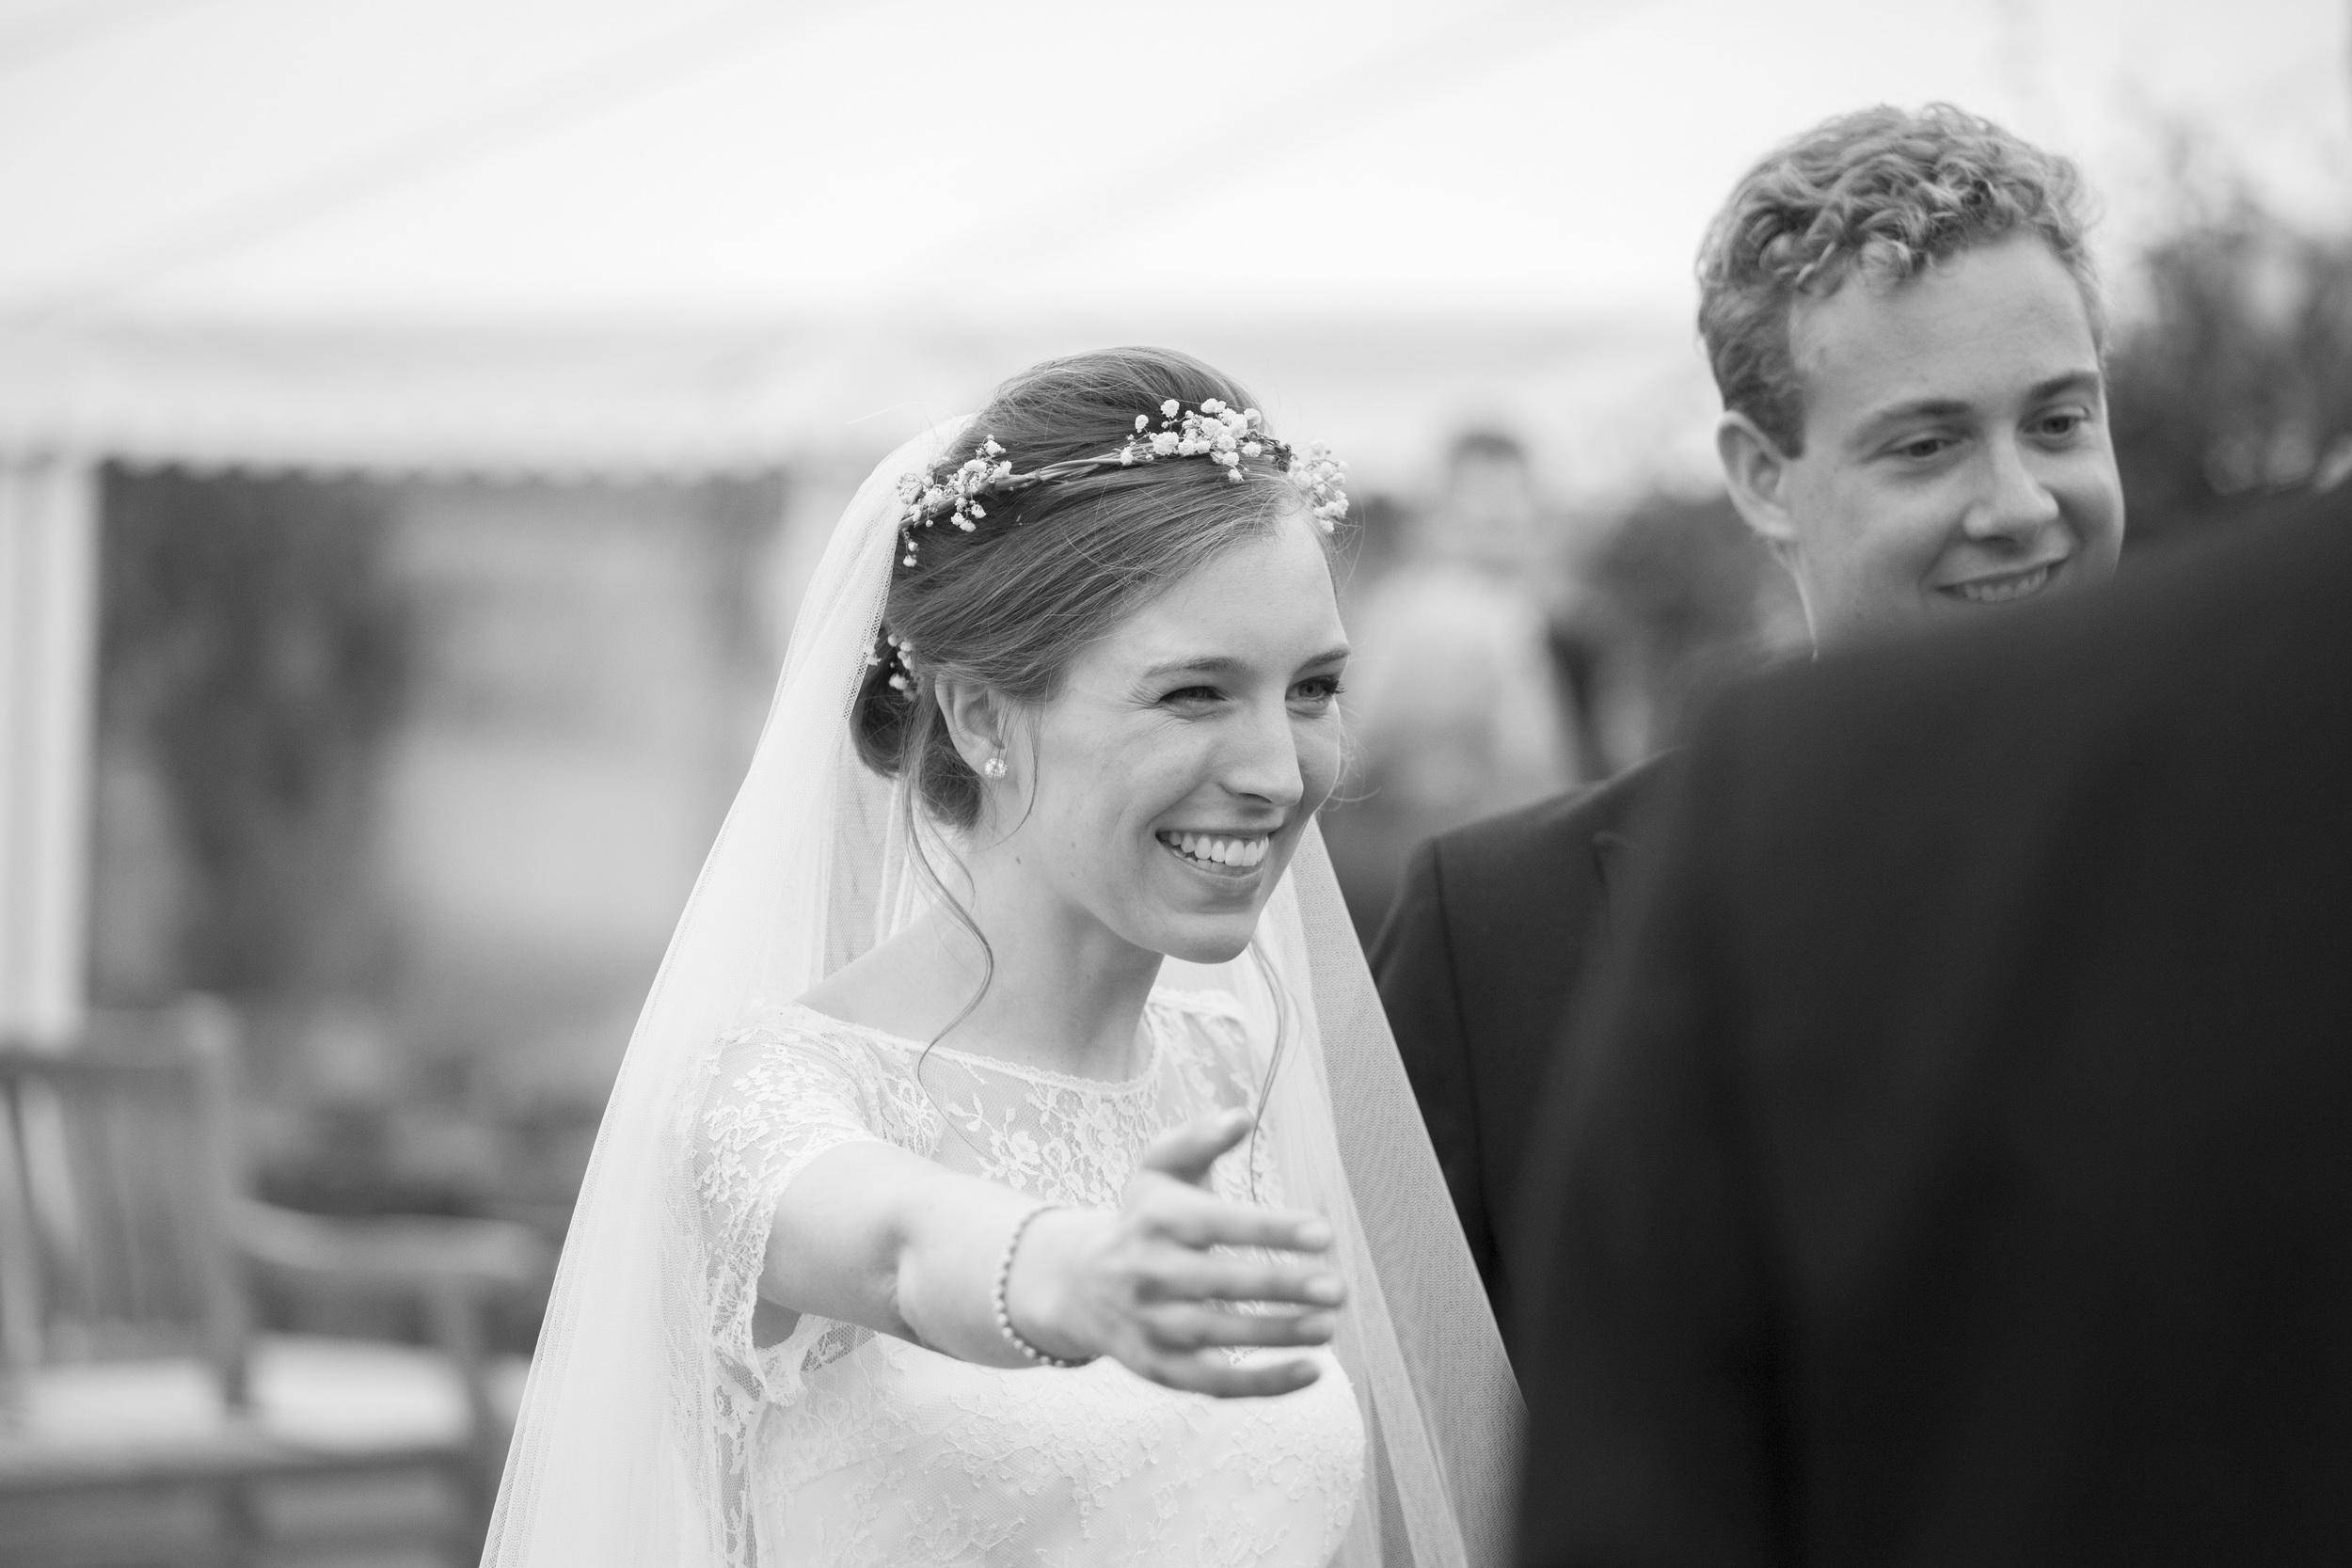 B-Sophie-Ralph-Shropshire-Wedding-Edit.jpg